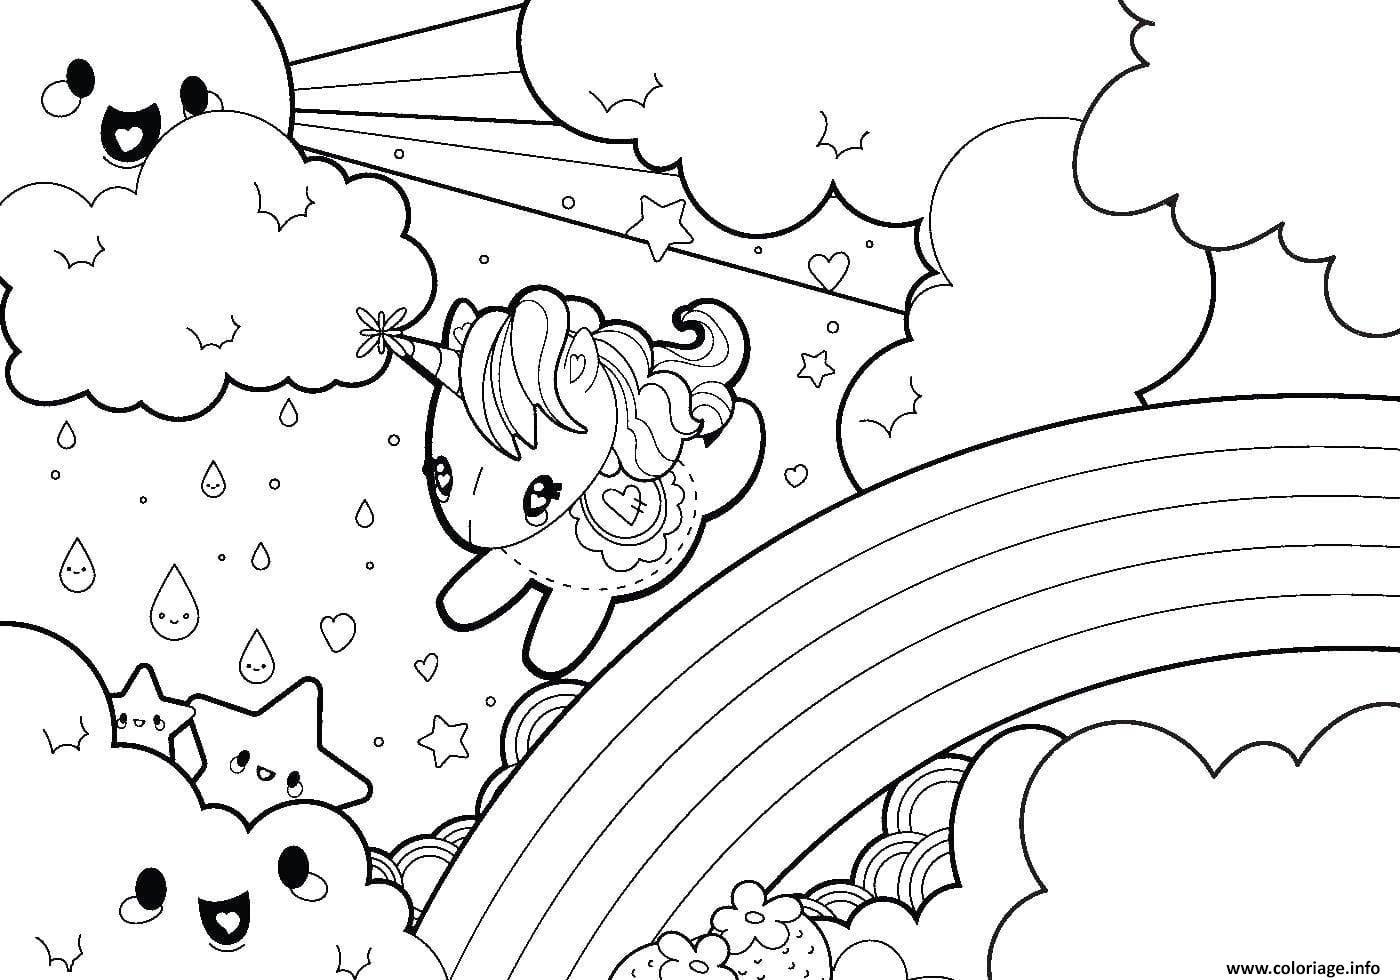 Coloriage Arc En Ciel Avec Licorne Kawaii Dessin